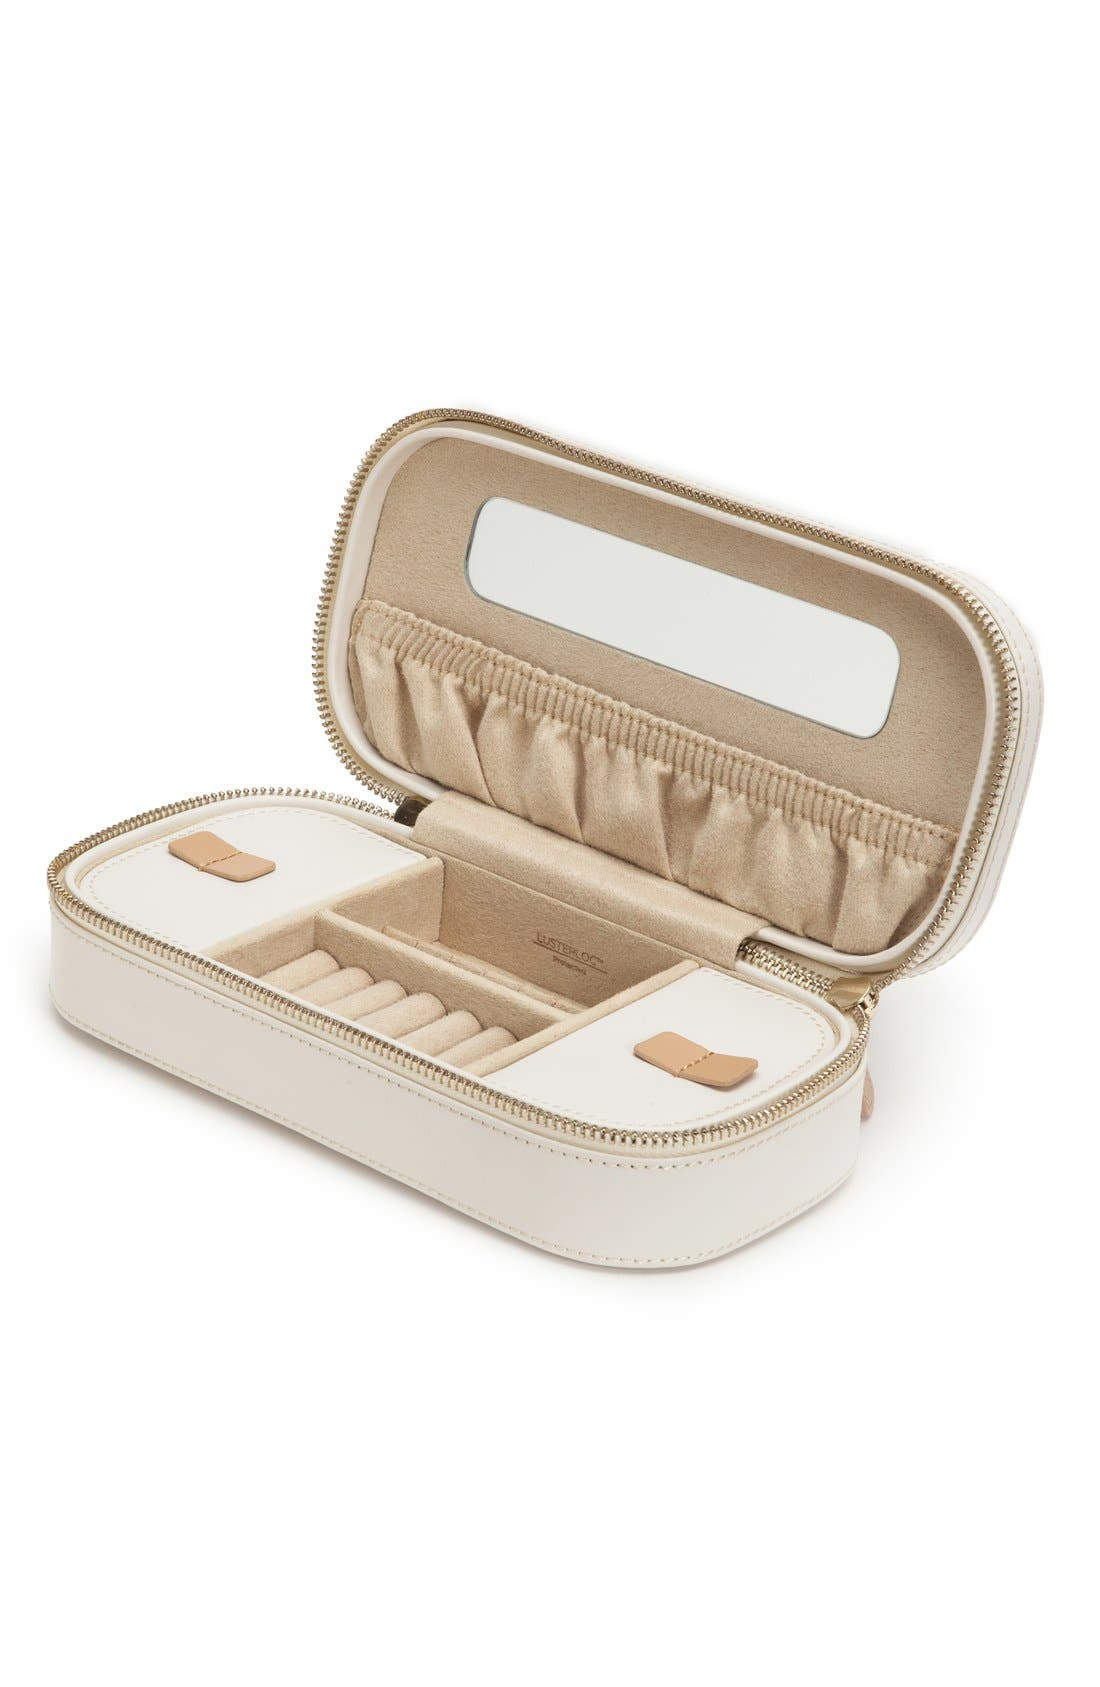 'Chloe' Zip Jewelry Case,                         Main,                         color, Cream